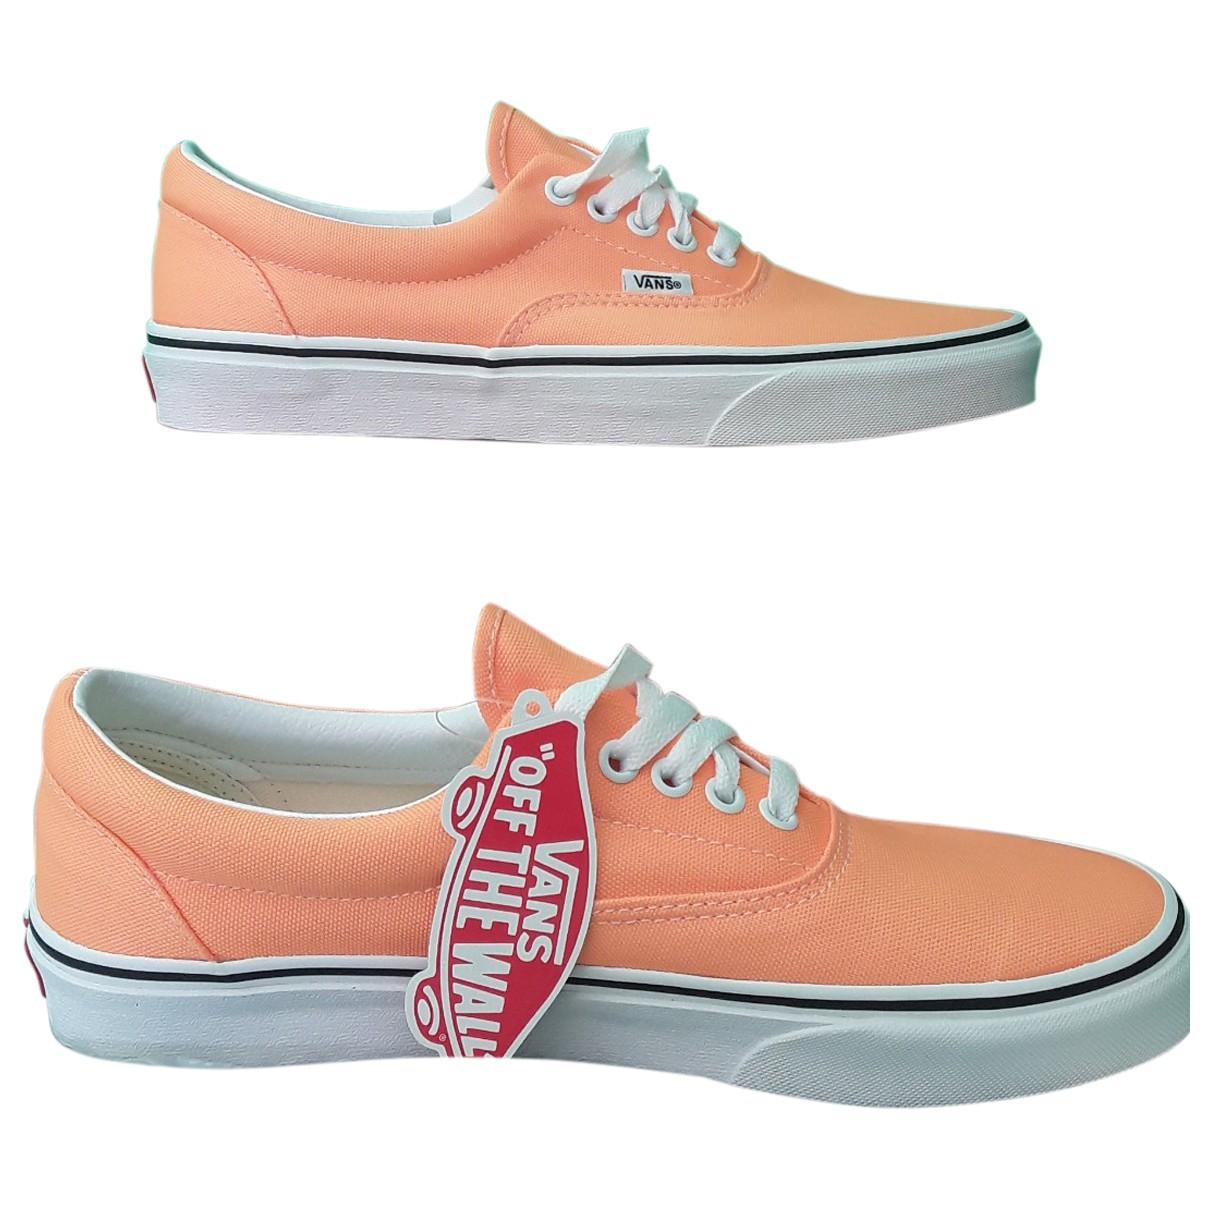 Vans N Orange Cloth Trainers for Men 41 EU